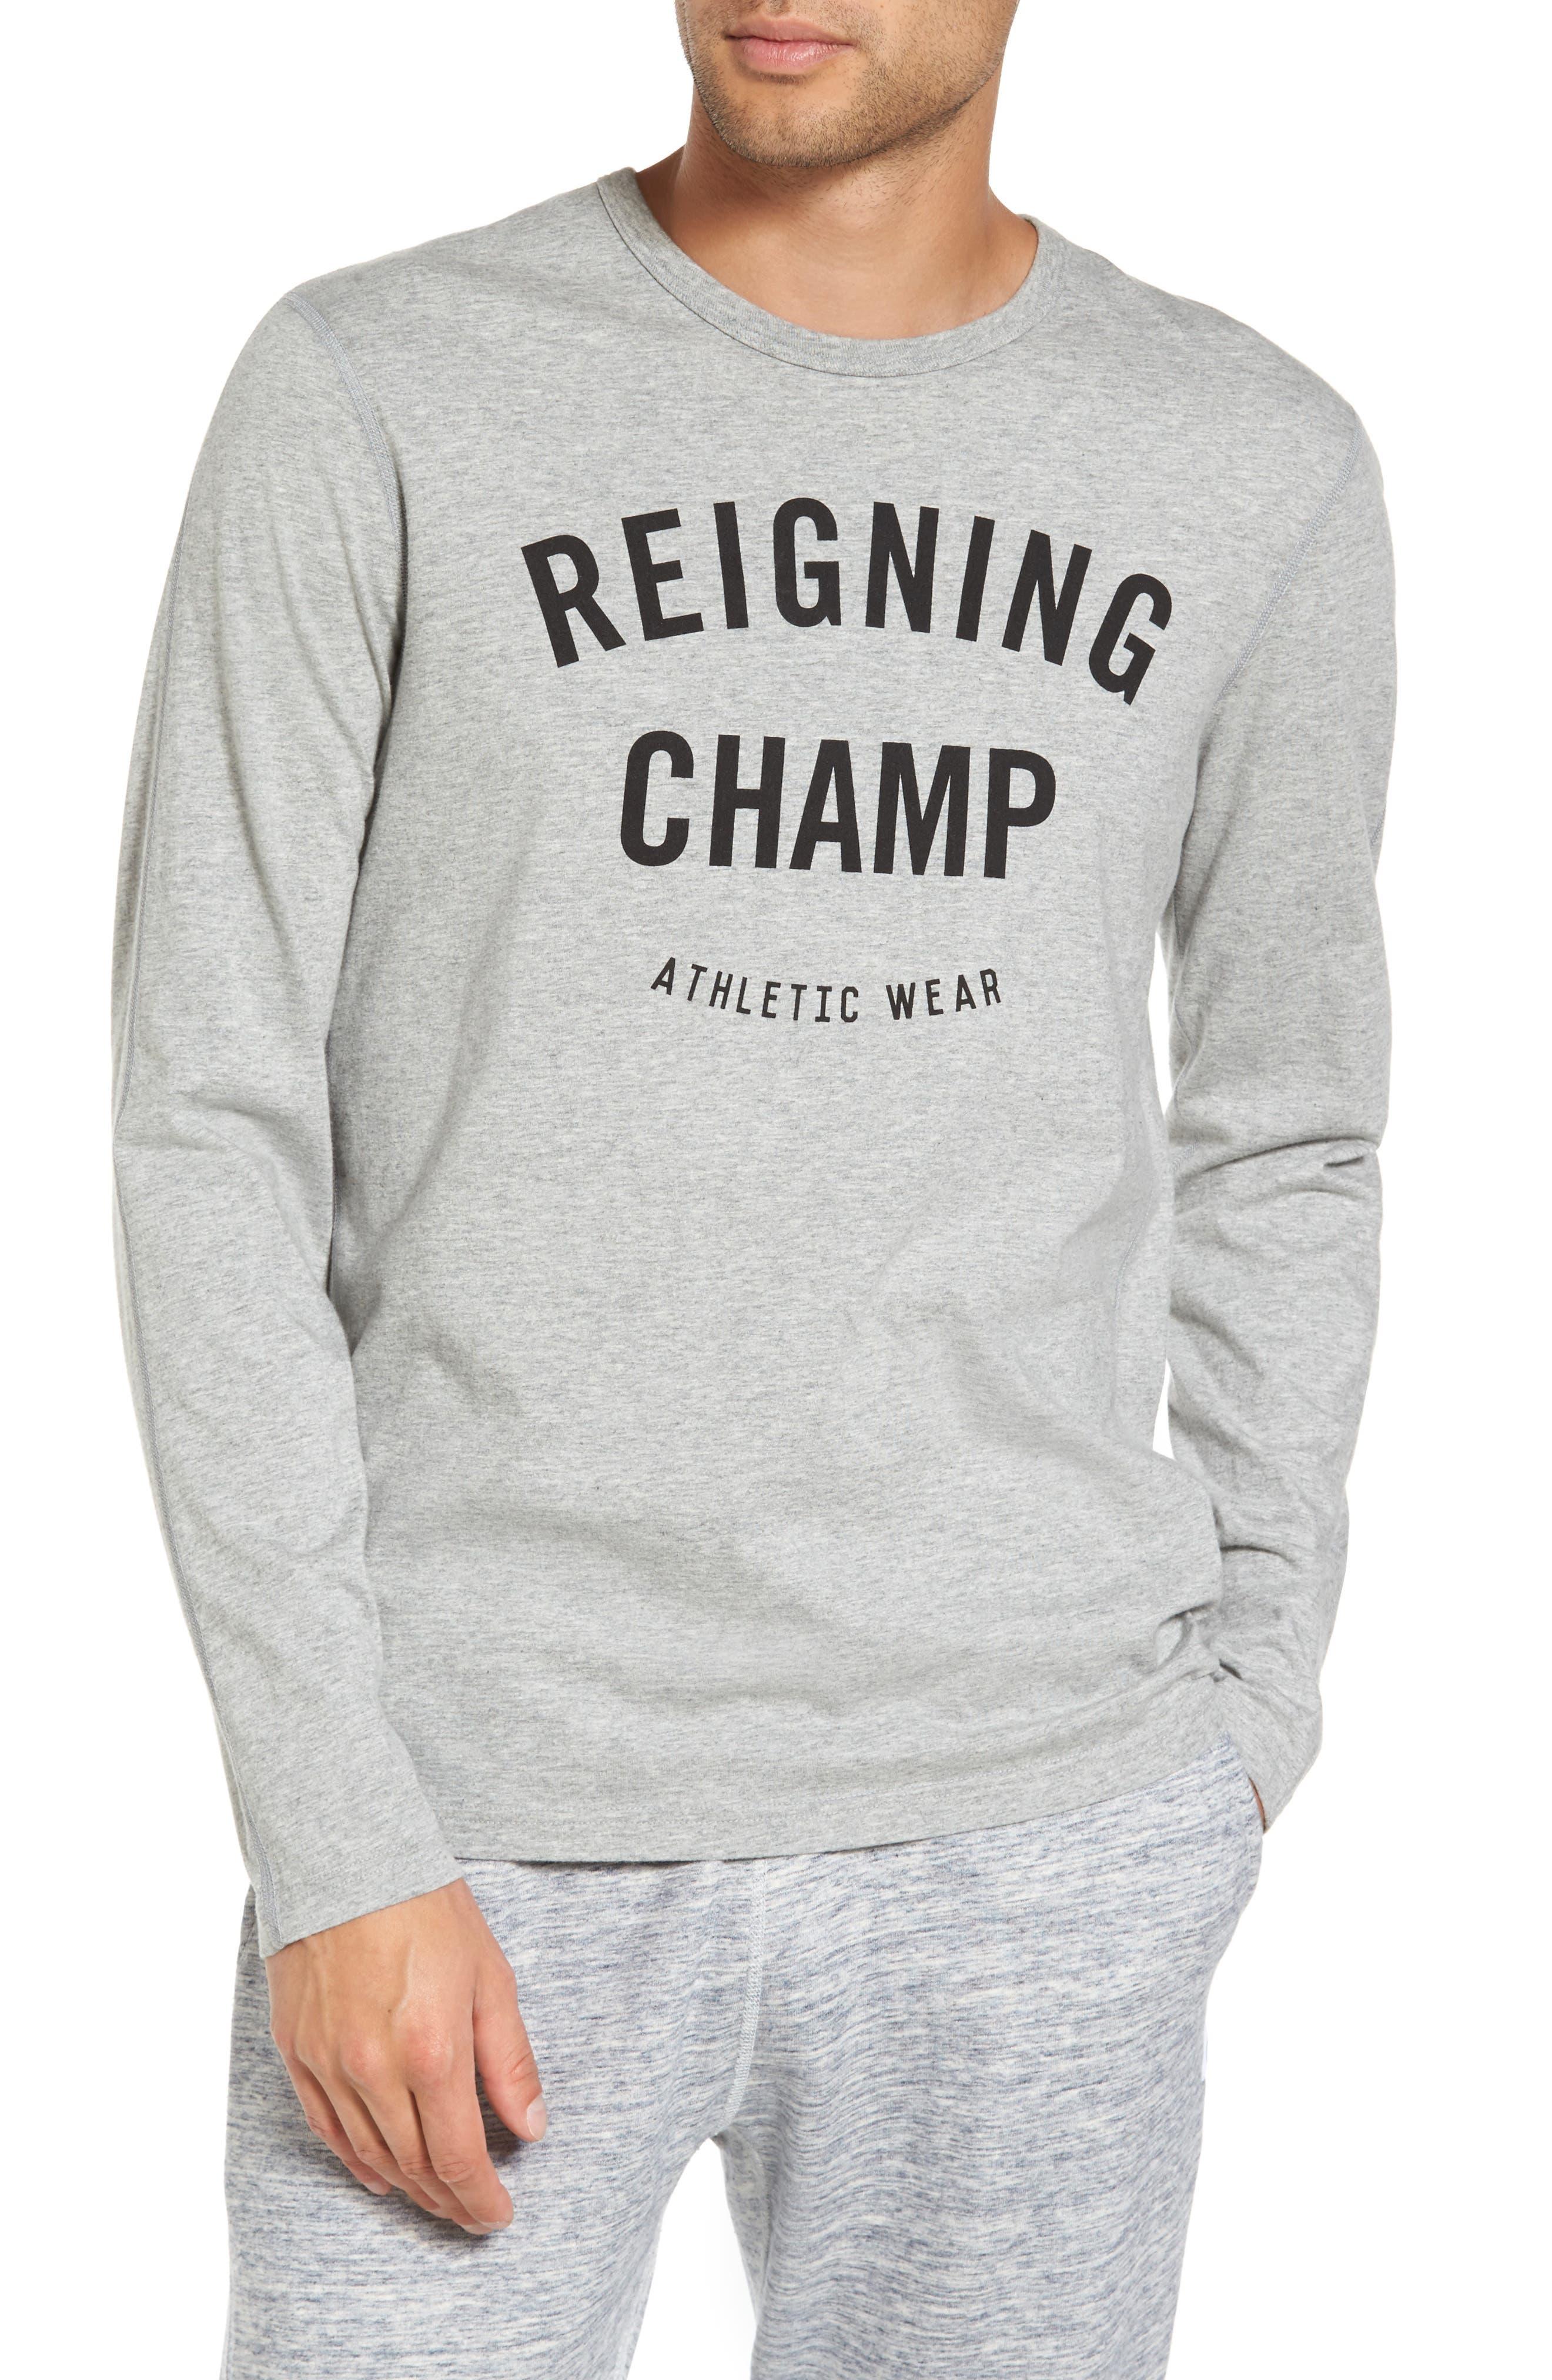 Alternate Image 1 Selected - Reigning Champ Gym Logo Long Sleeve T-Shirt